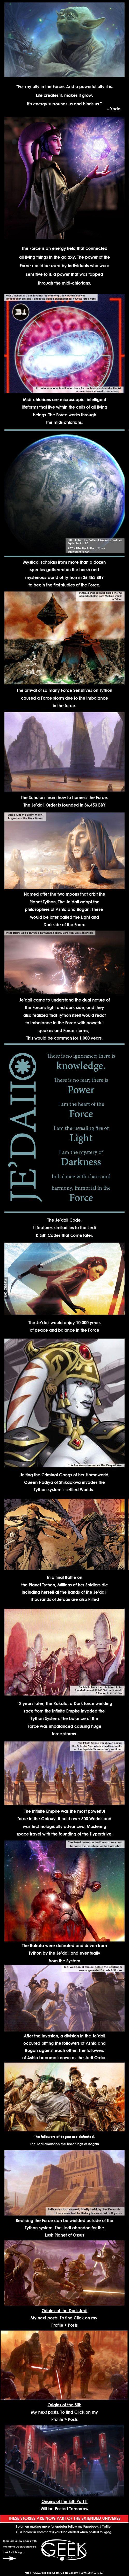 Origins of the Jedi (Star Wars History)